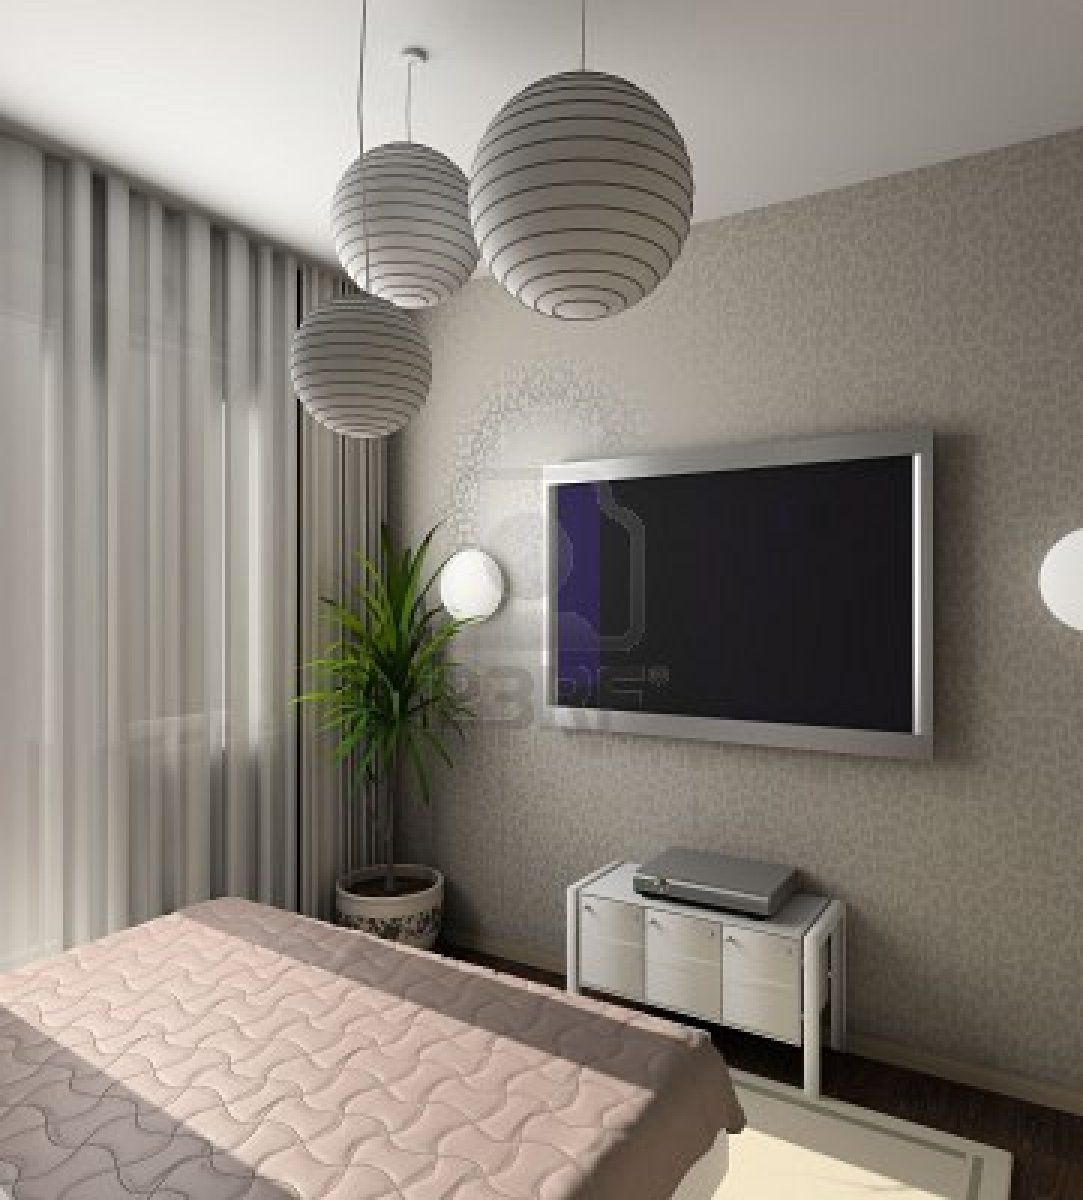 bedroom tv table design | design ideas 2017-2018 | Pinterest ...